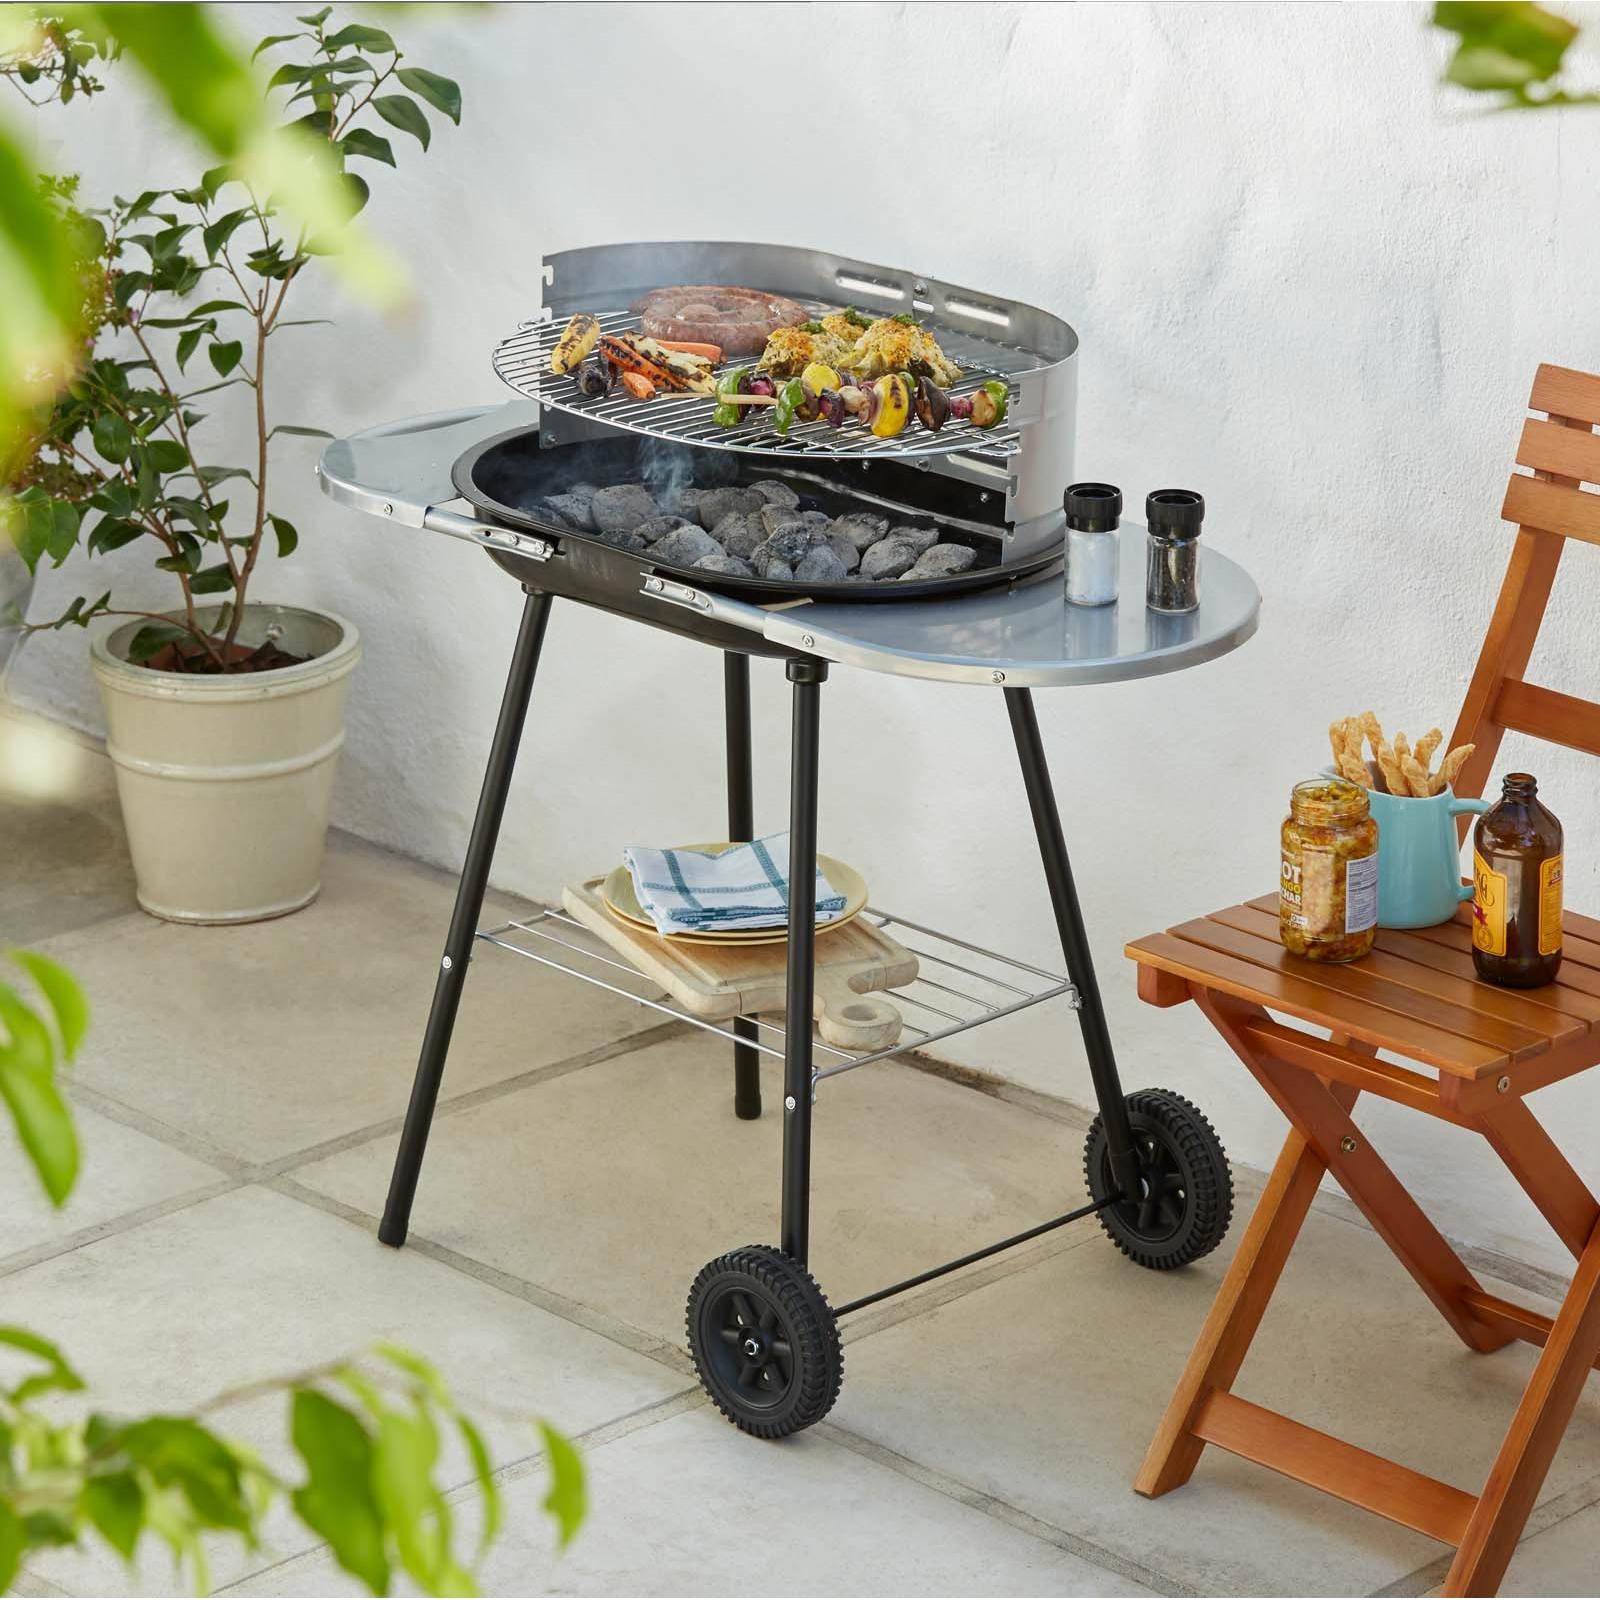 Jumbuck Oval Trolley Charcoal BBQ only £12 @ Homebase